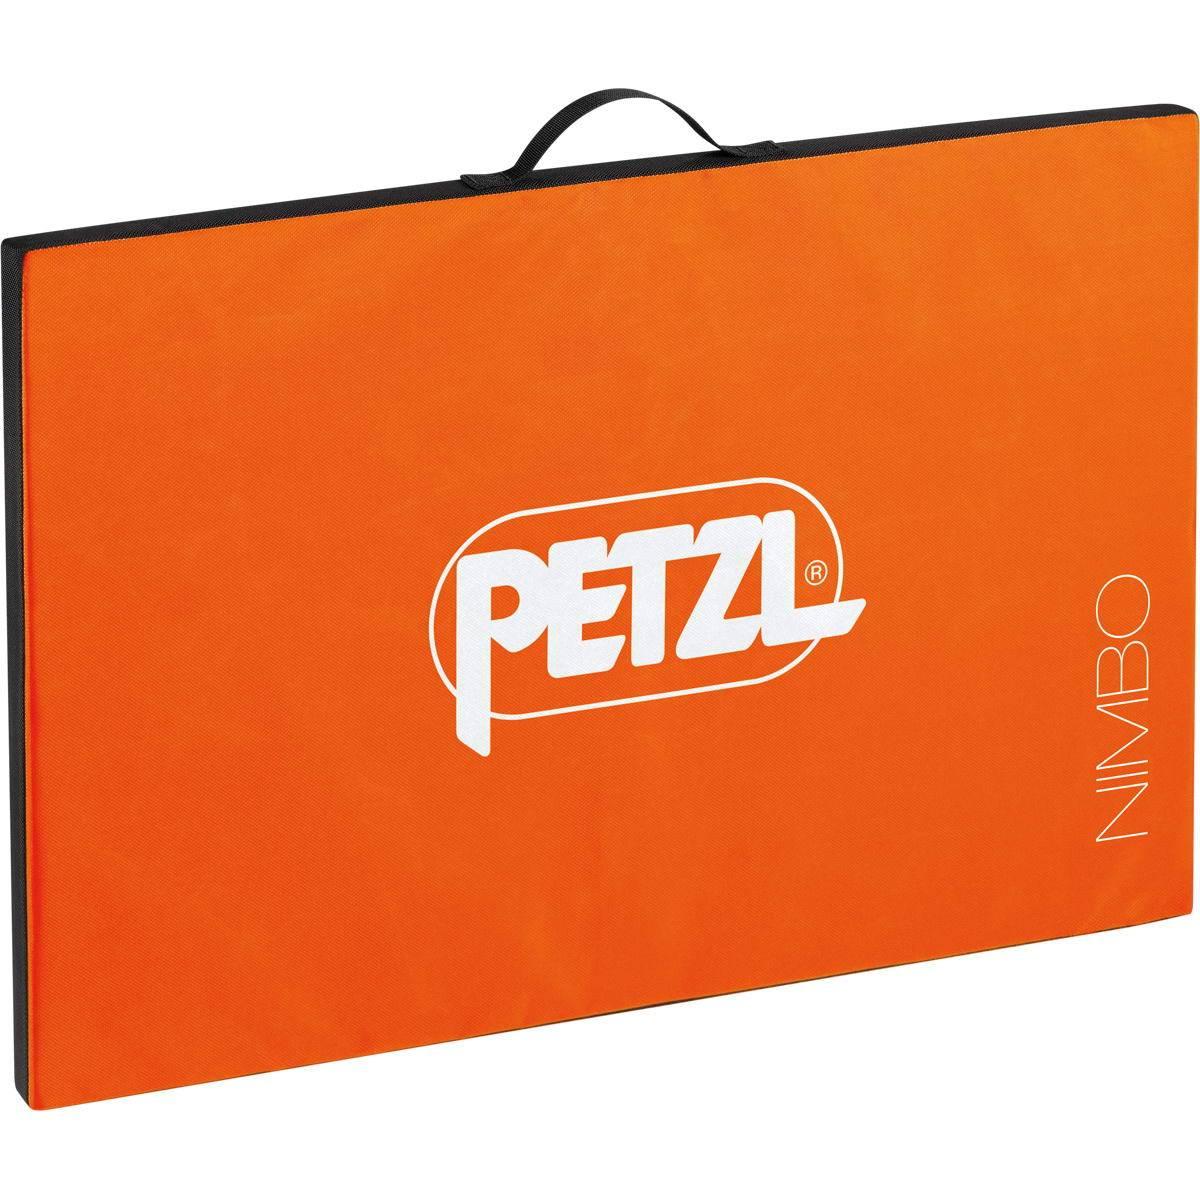 Petzl Nimbo - Sitzstart-Pad zum Bouldern - Bild 1